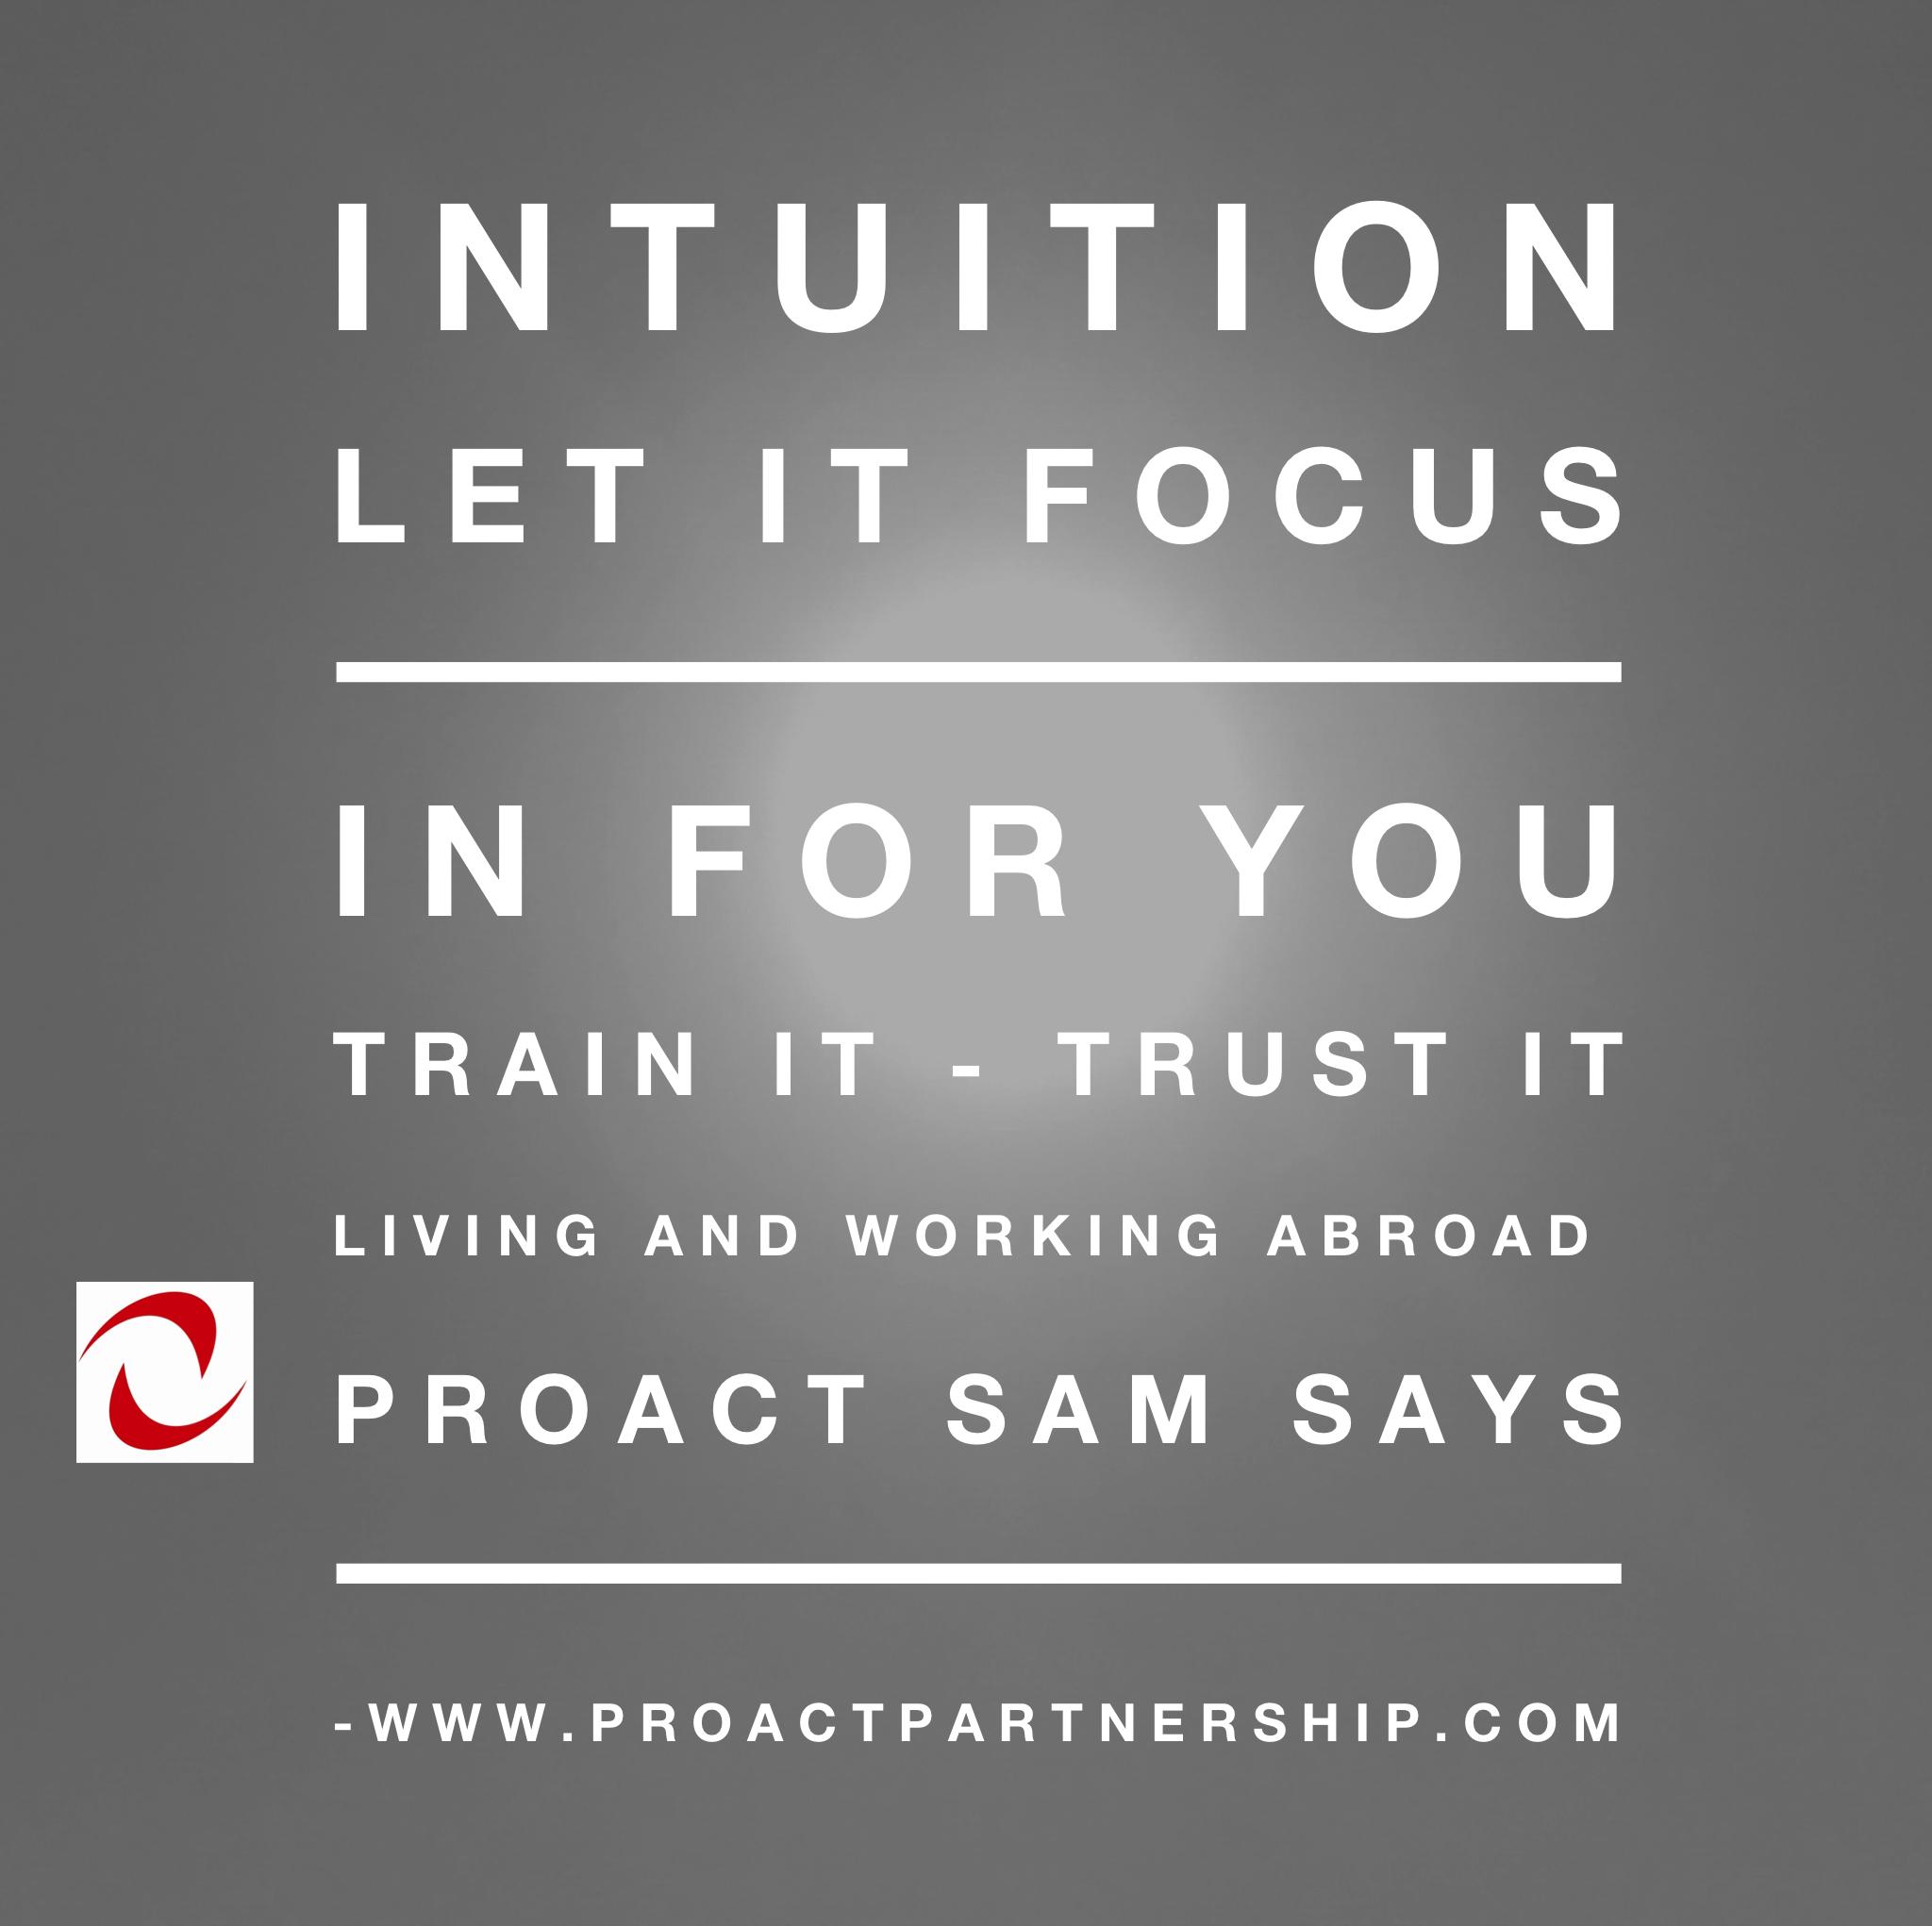 www.proactpartnership.com/register